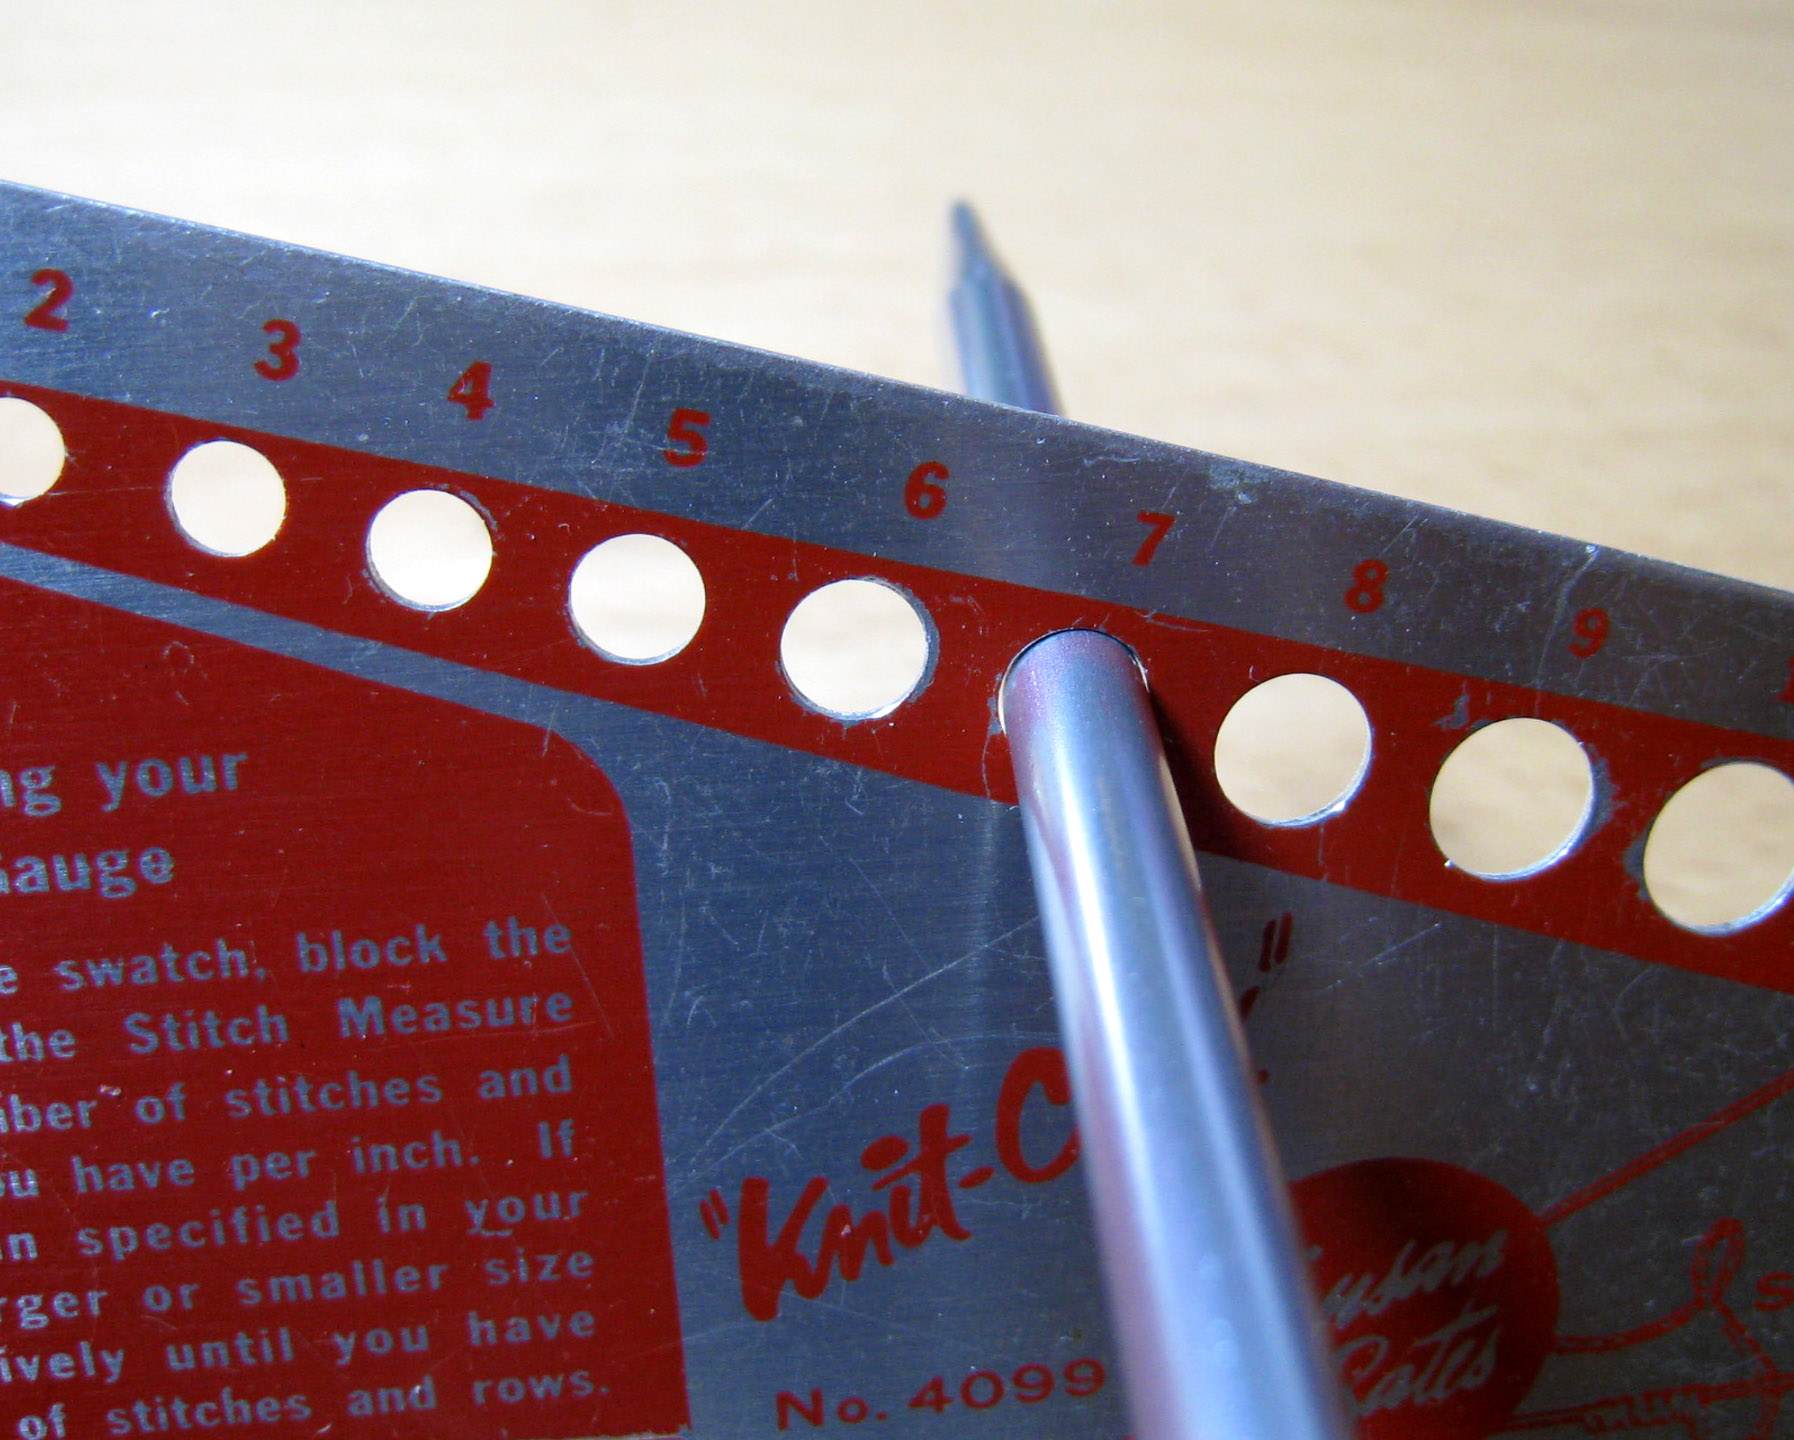 File:Knitting needle size check.jpg